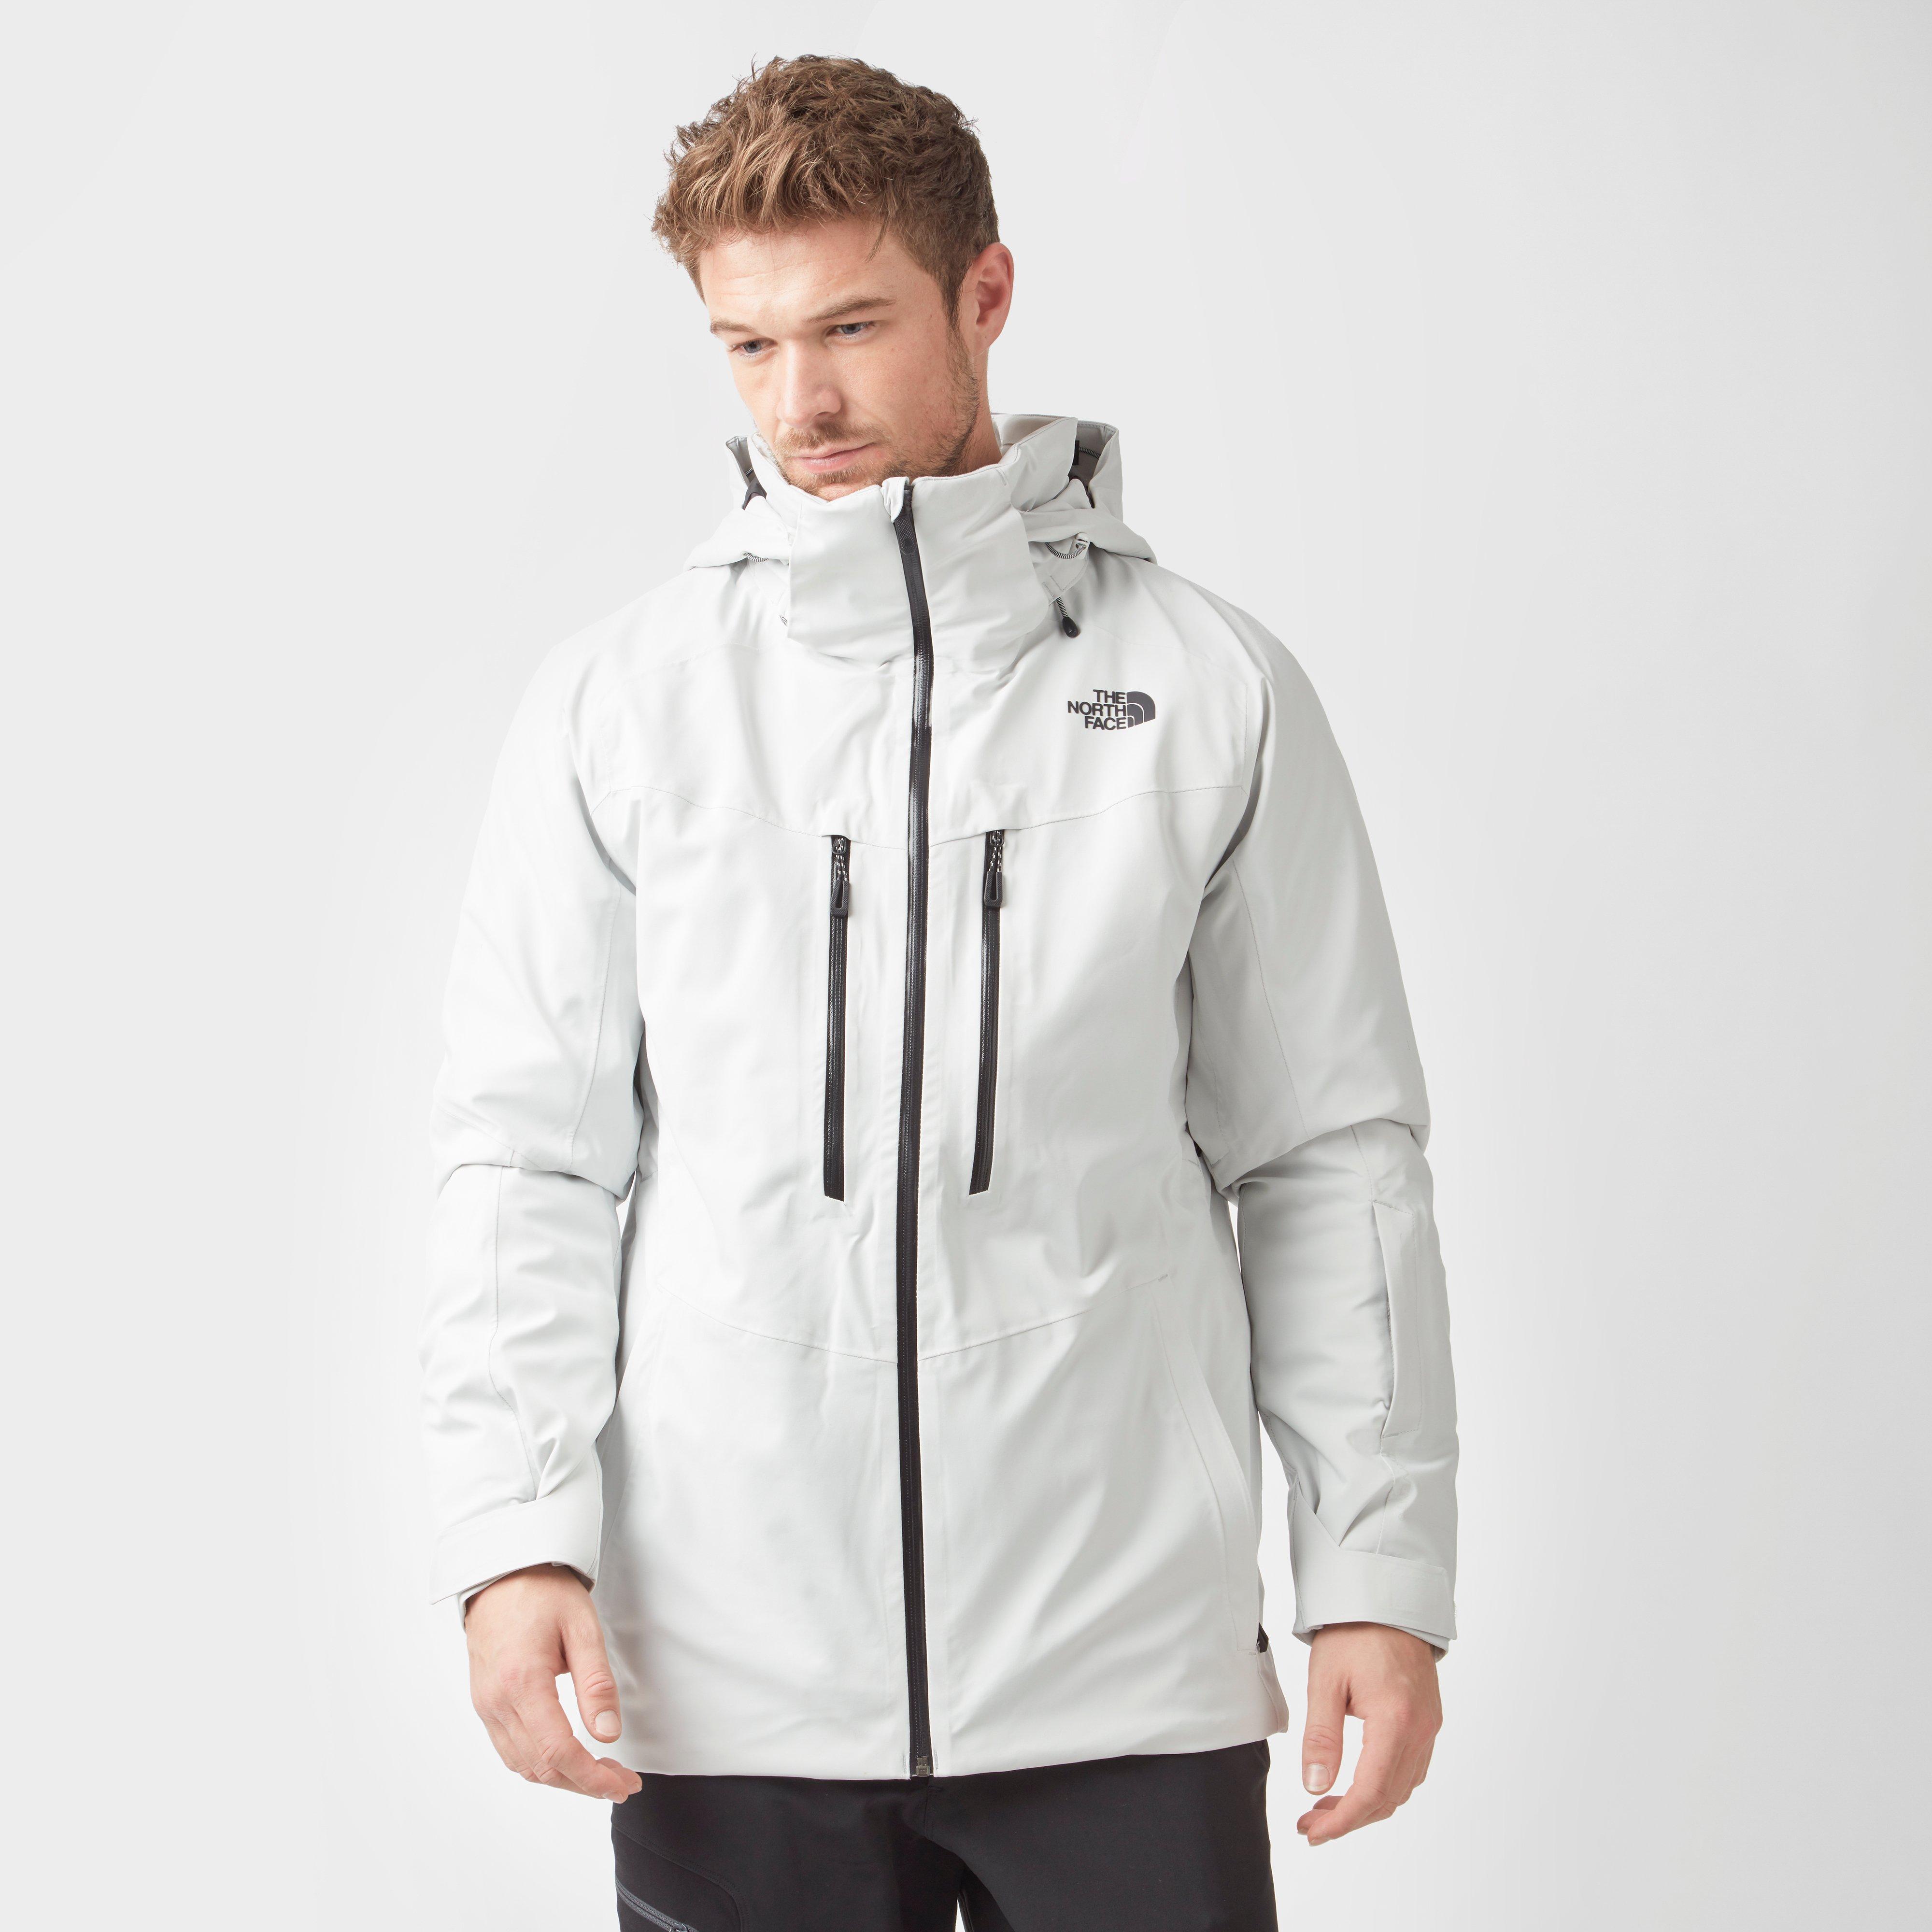 c0dc9756362a The North Face Men s Chakal Ski Jacket White